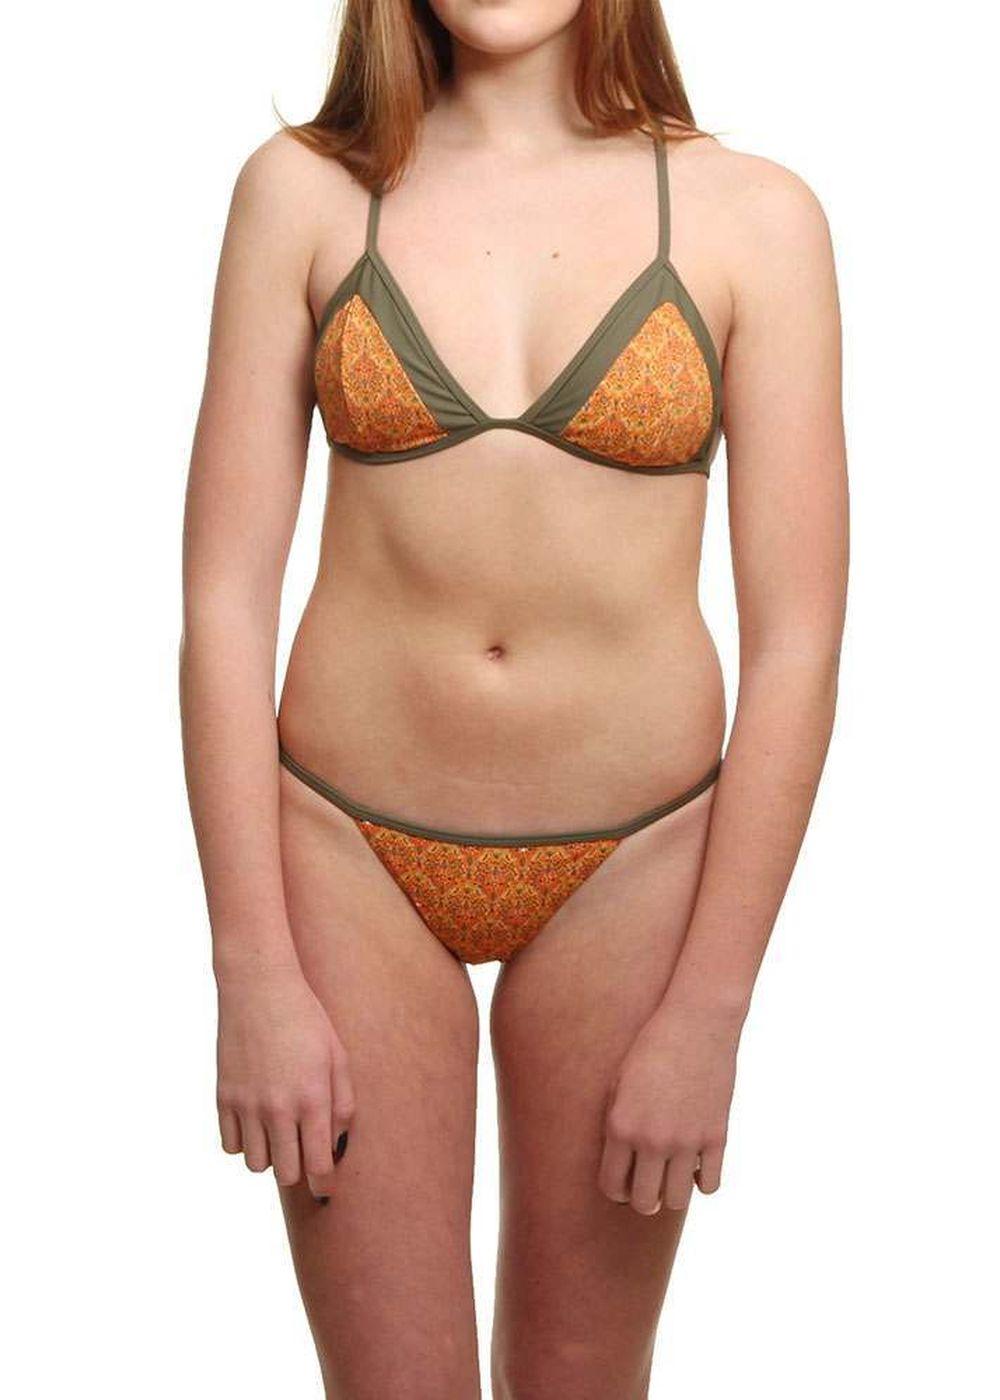 pukas-double-tri-bikini-orange-bitzgane